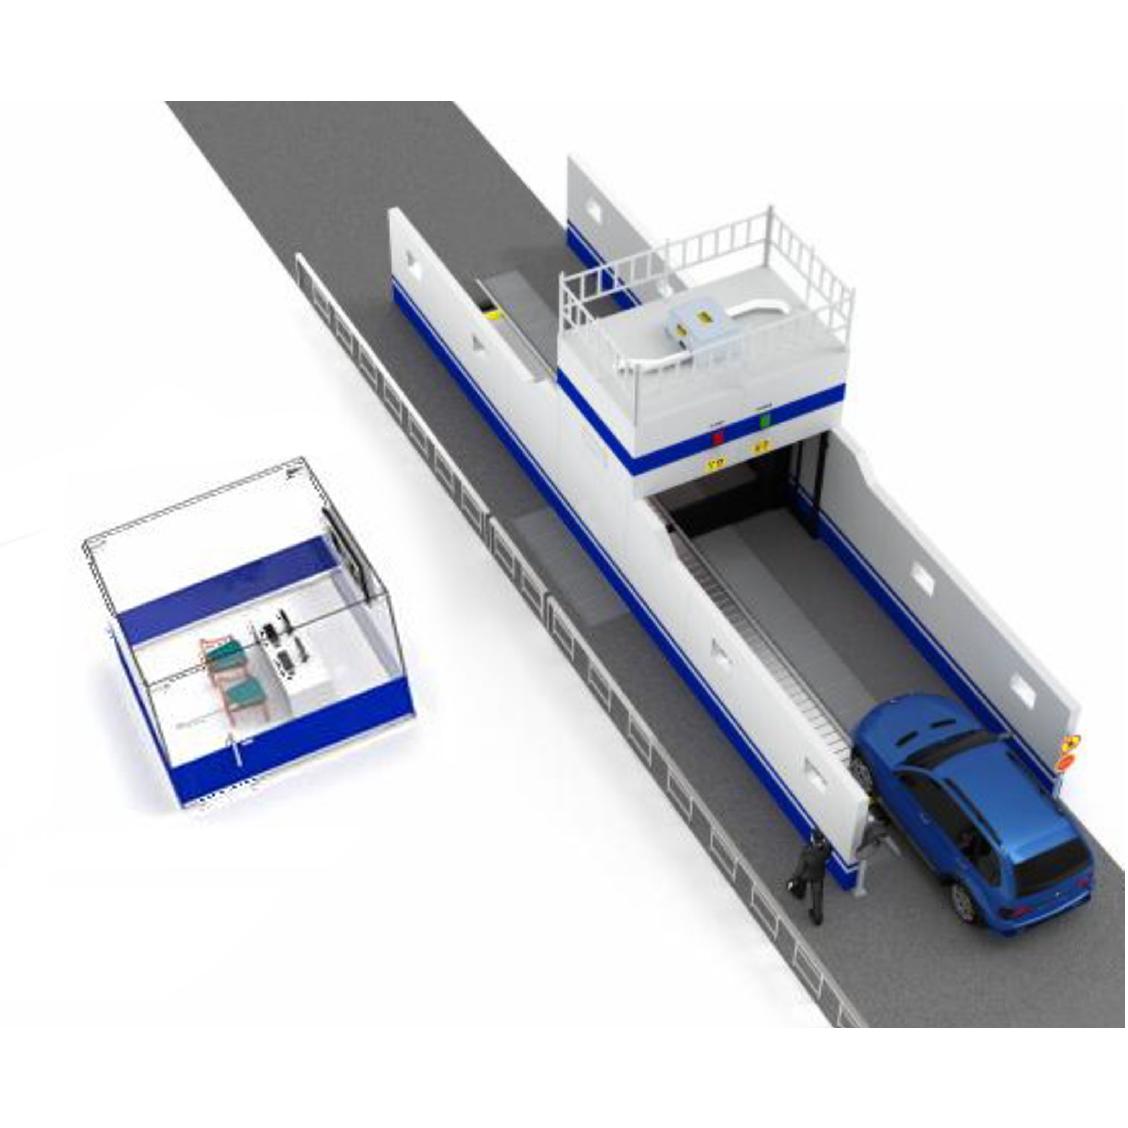 2MX-280300-320KVU Vehicle Inspection System with Conveyor Belt